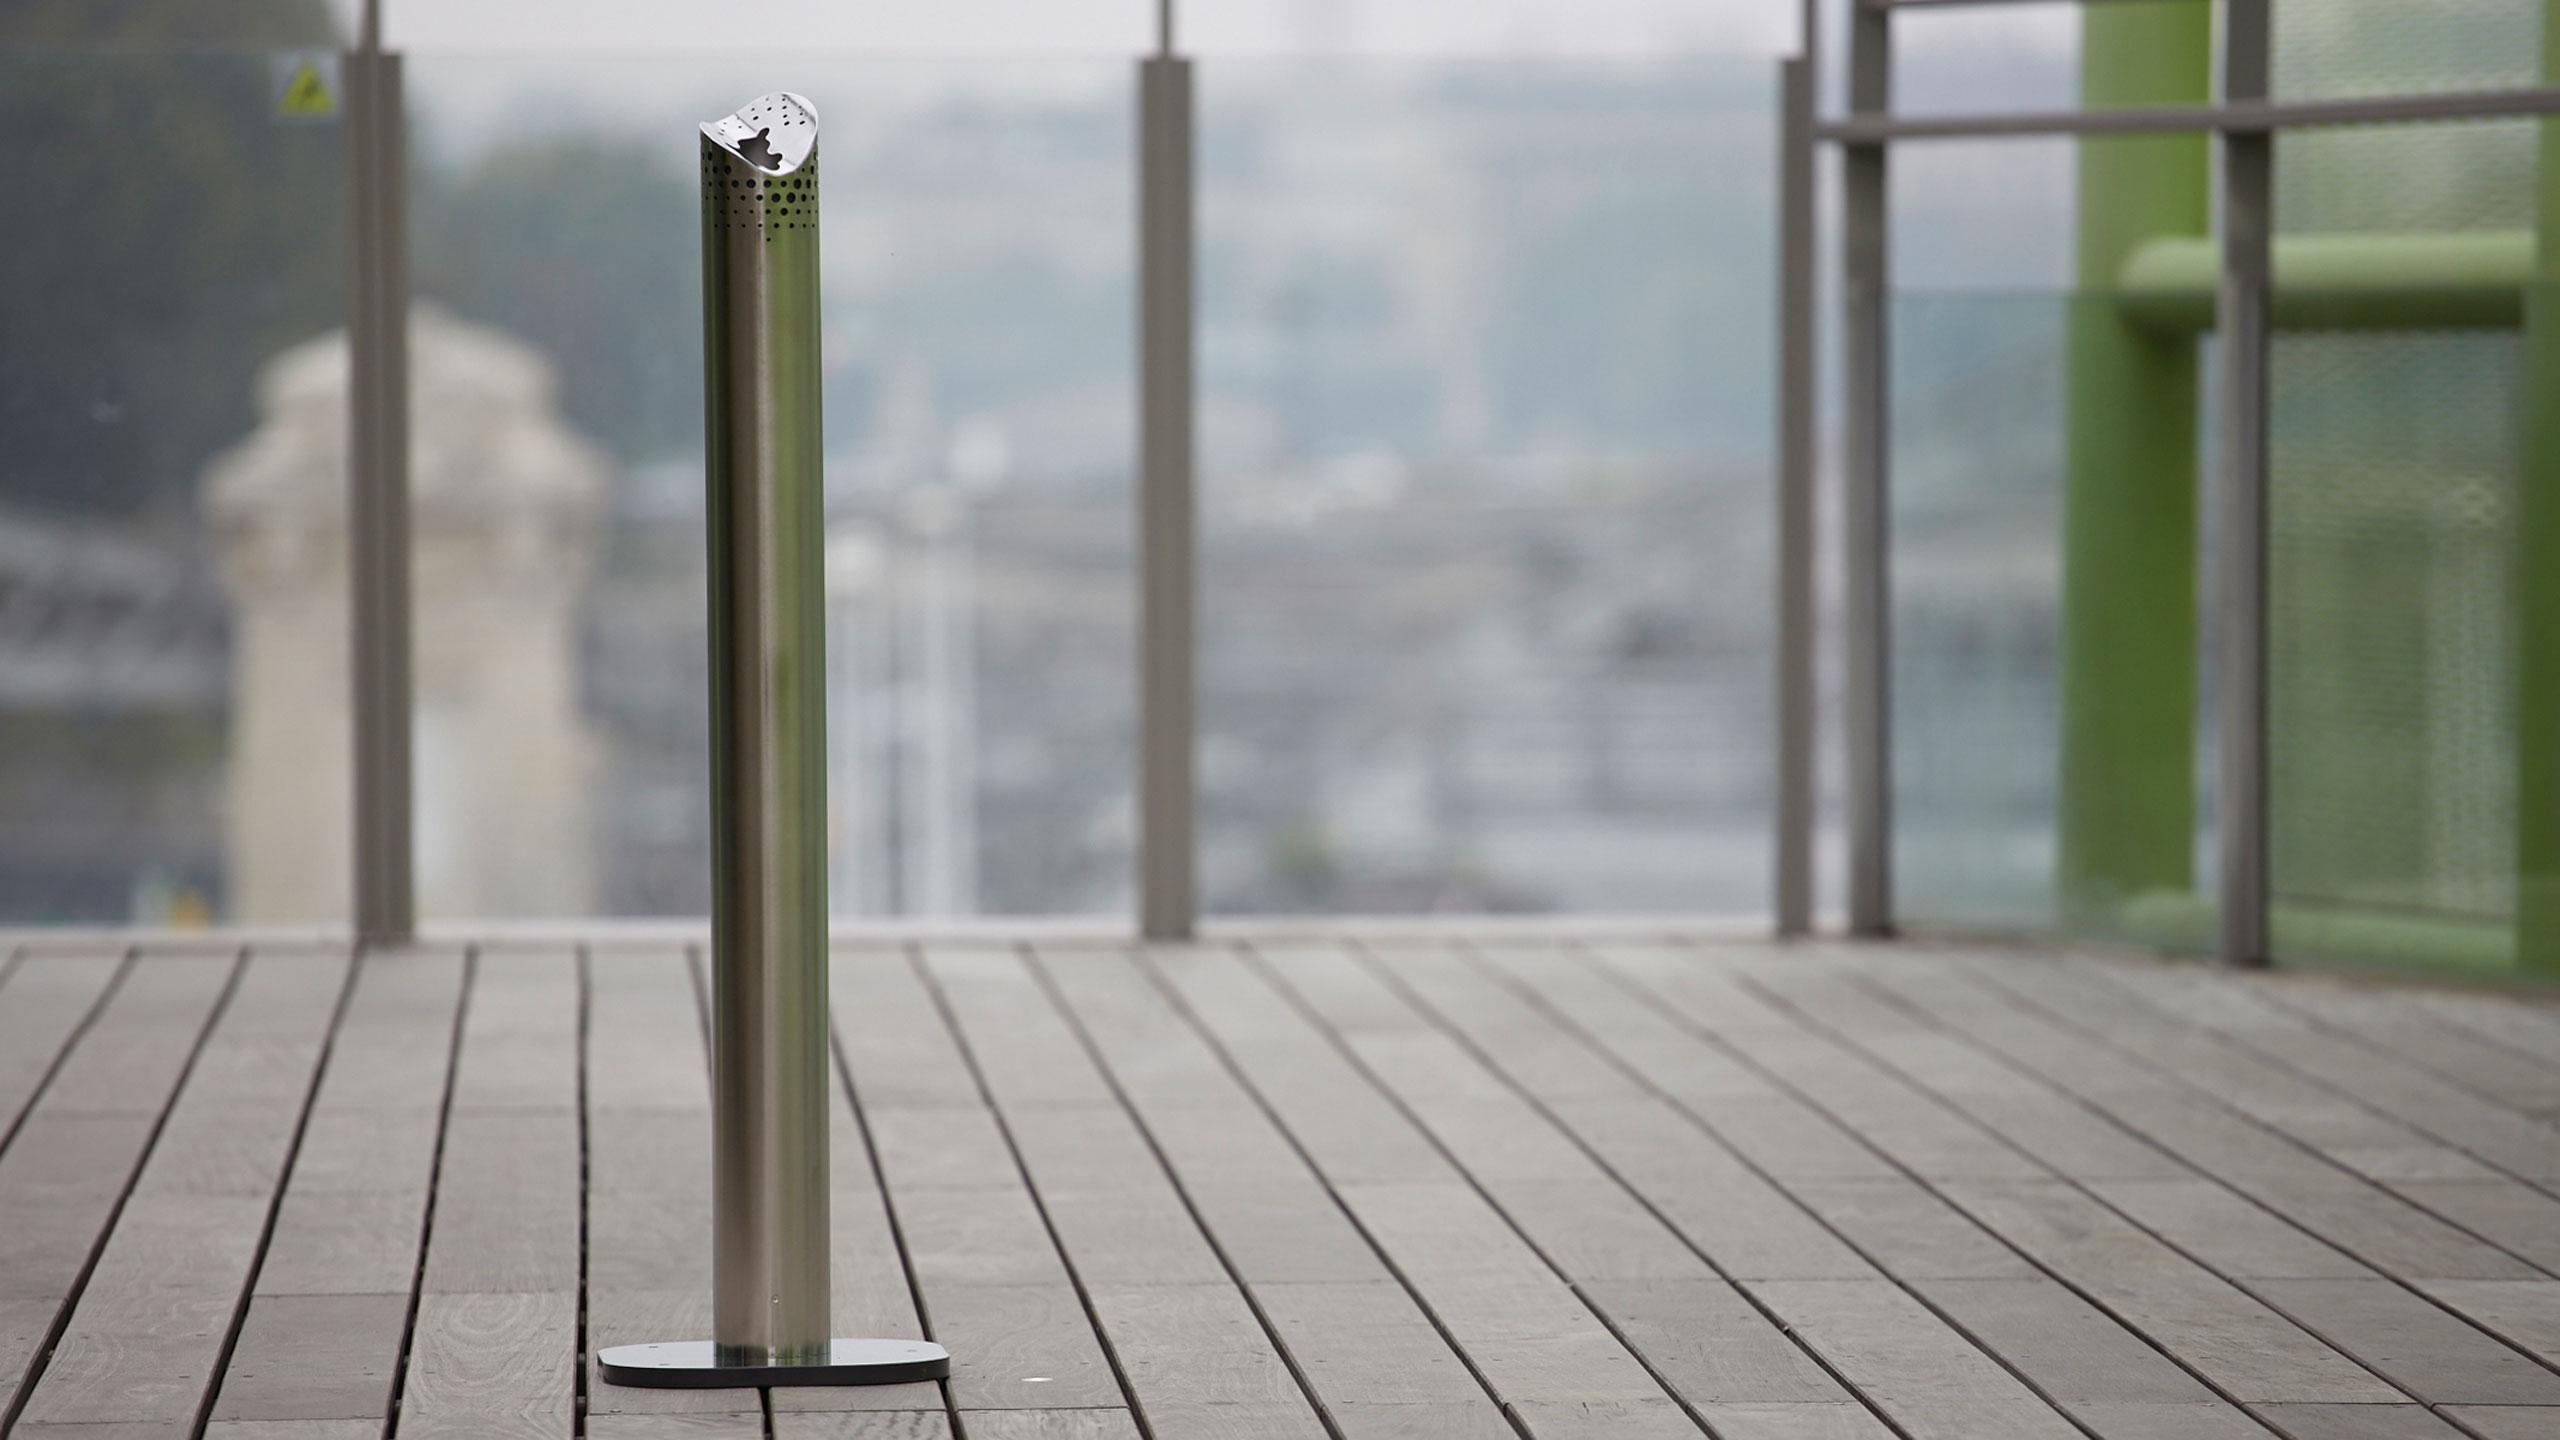 Manques cendrier objets publics design franck magné mobilier urbain